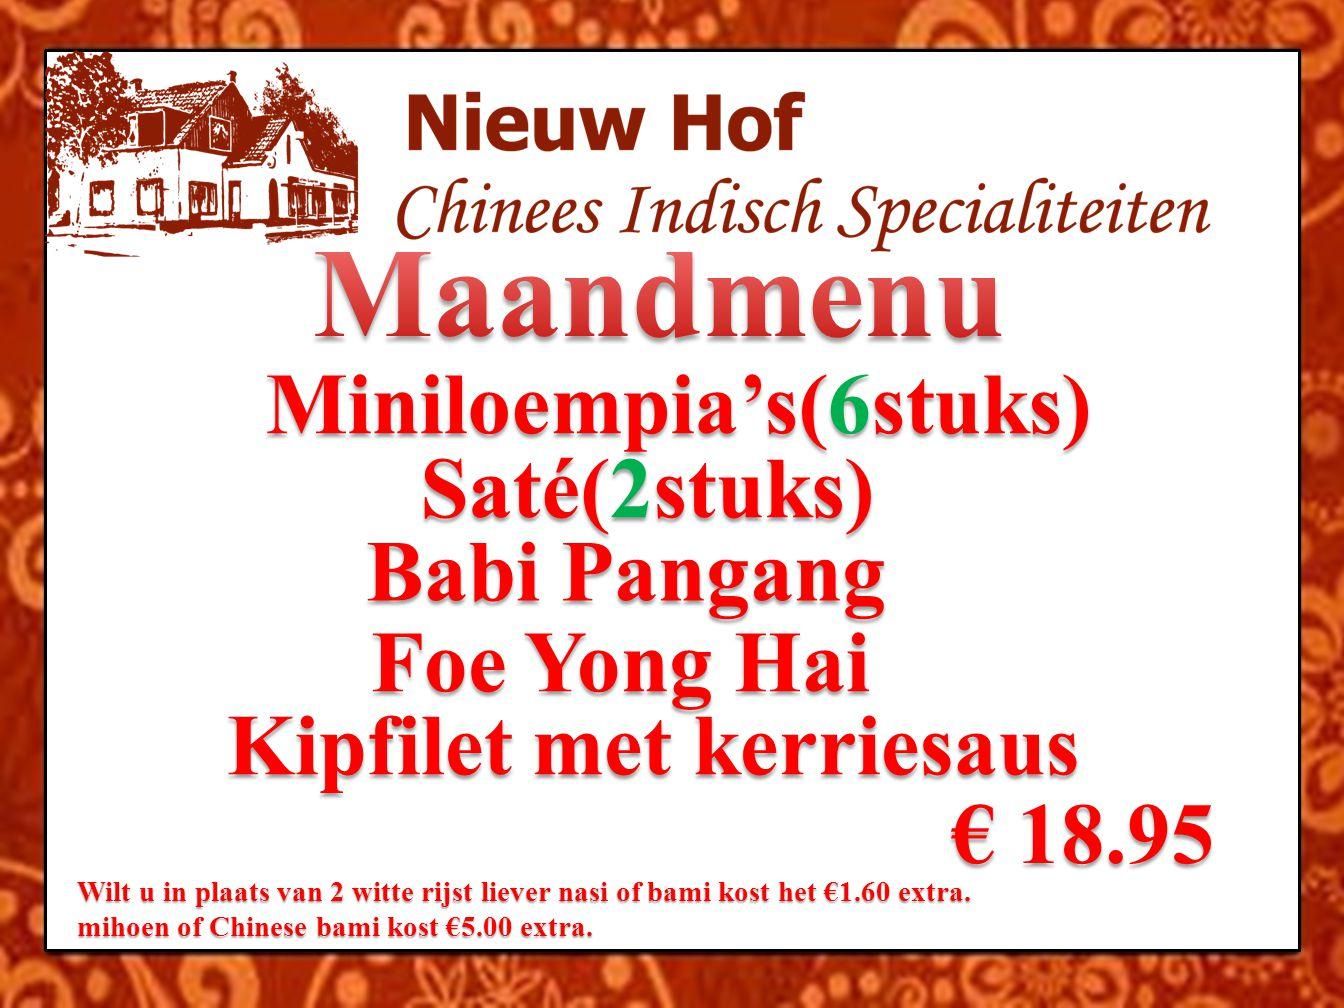 Maandmenu Miniloempia's(6stuks) Saté(2stuks) Babi Pangang Foe Yong Hai